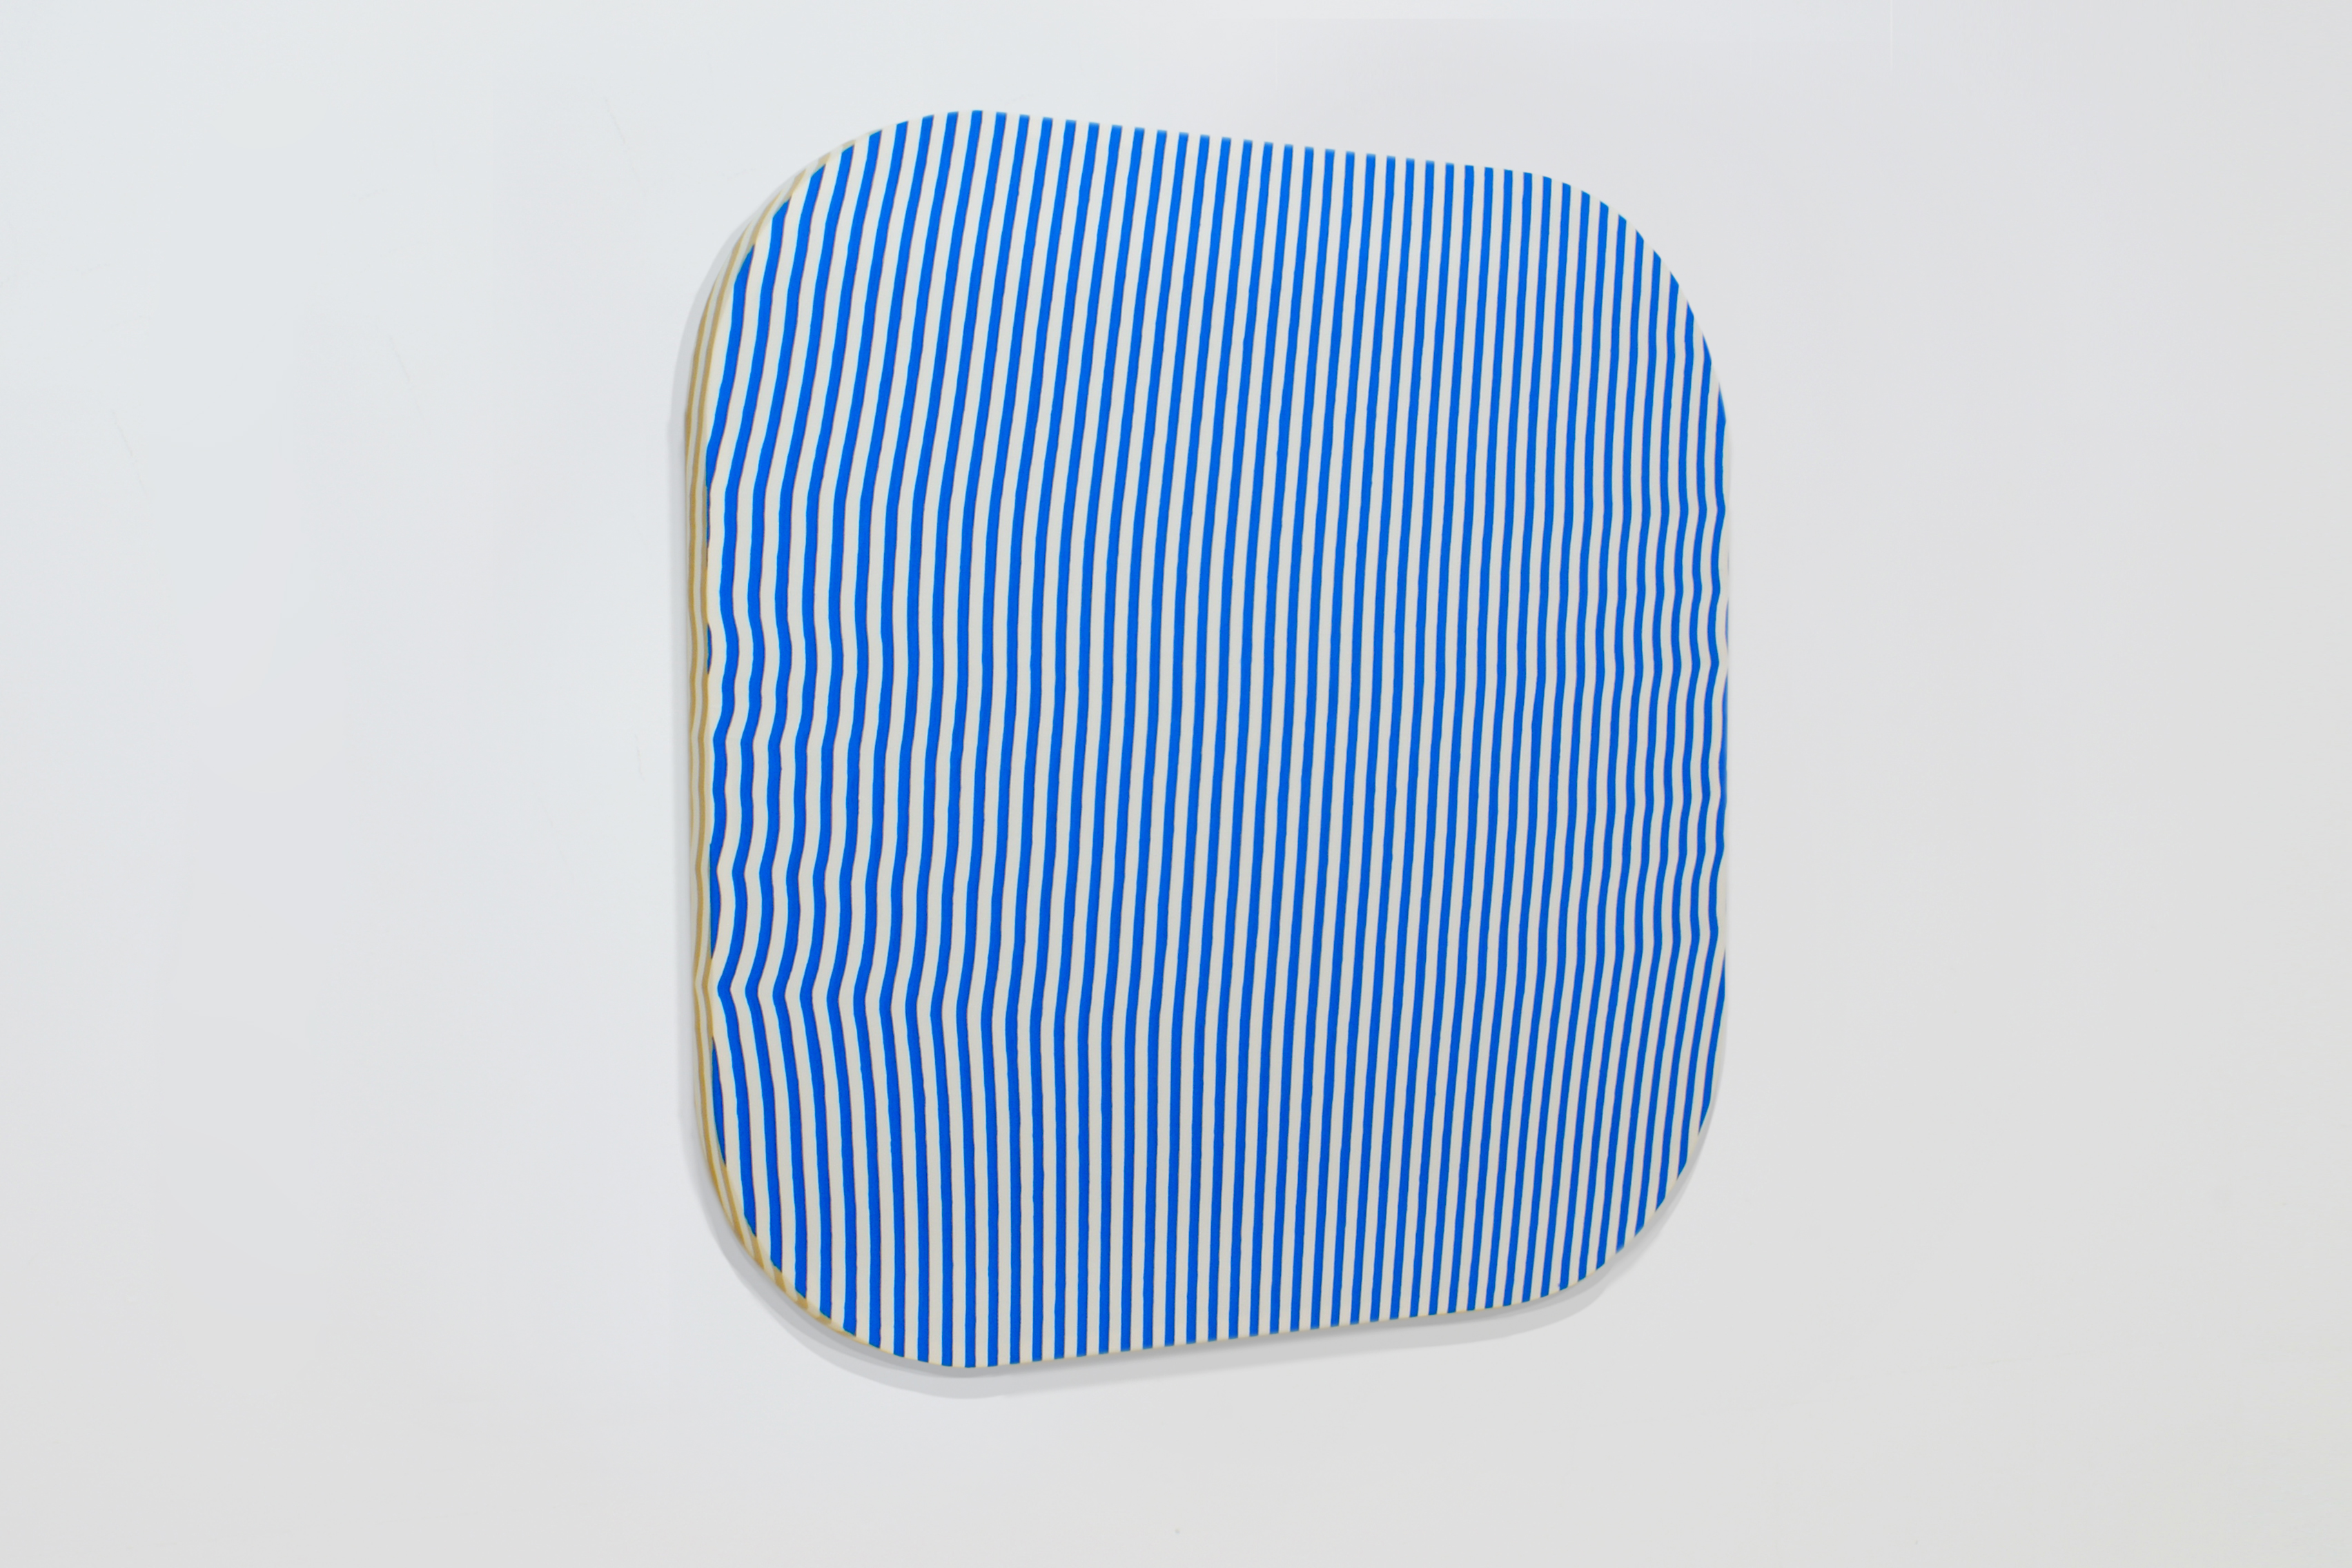 Davide Mancini Zanchi, Table Cloth WB-B, Acrylic on Table Cloth, 165x165cm, 2017